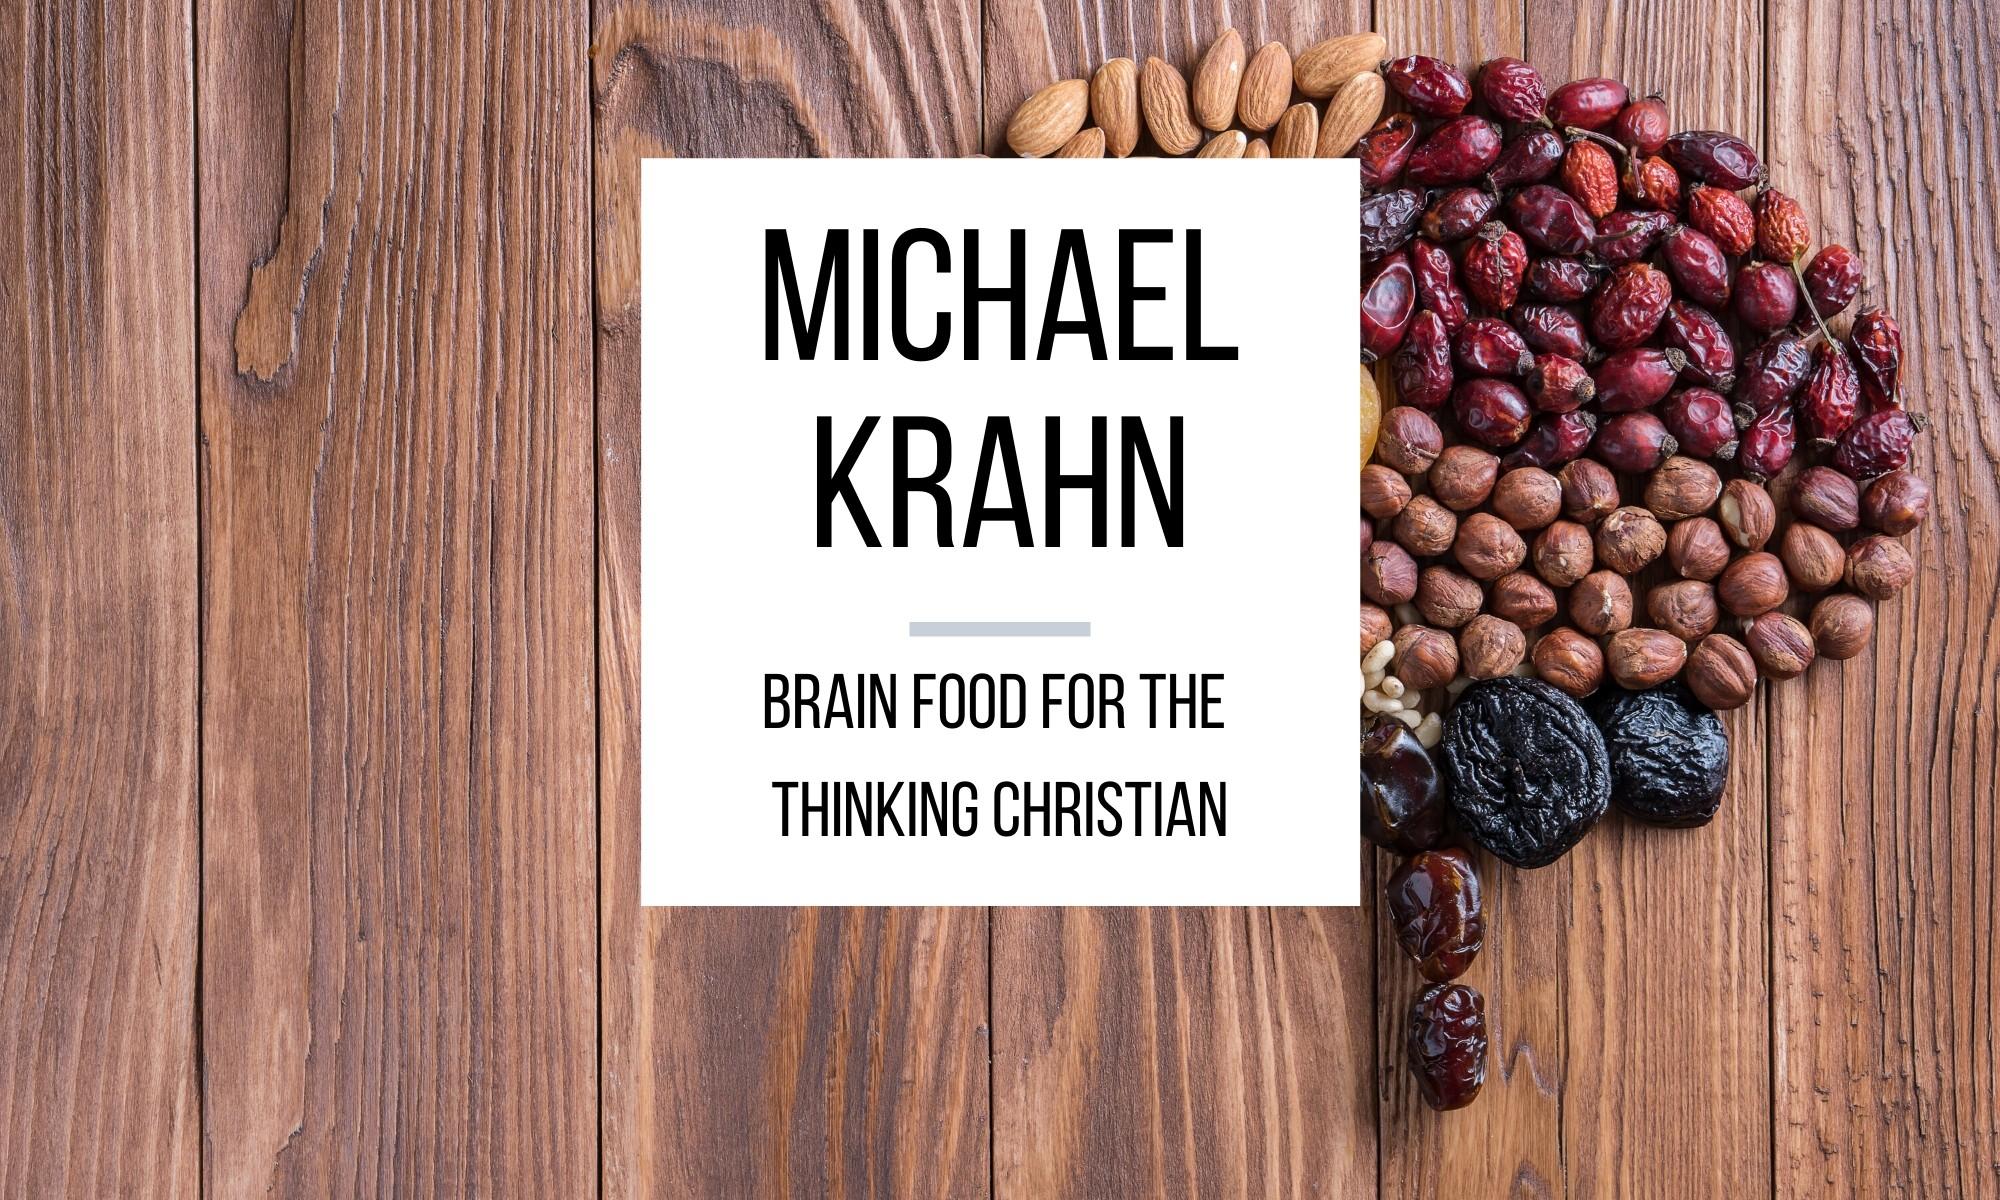 Michael Krahn